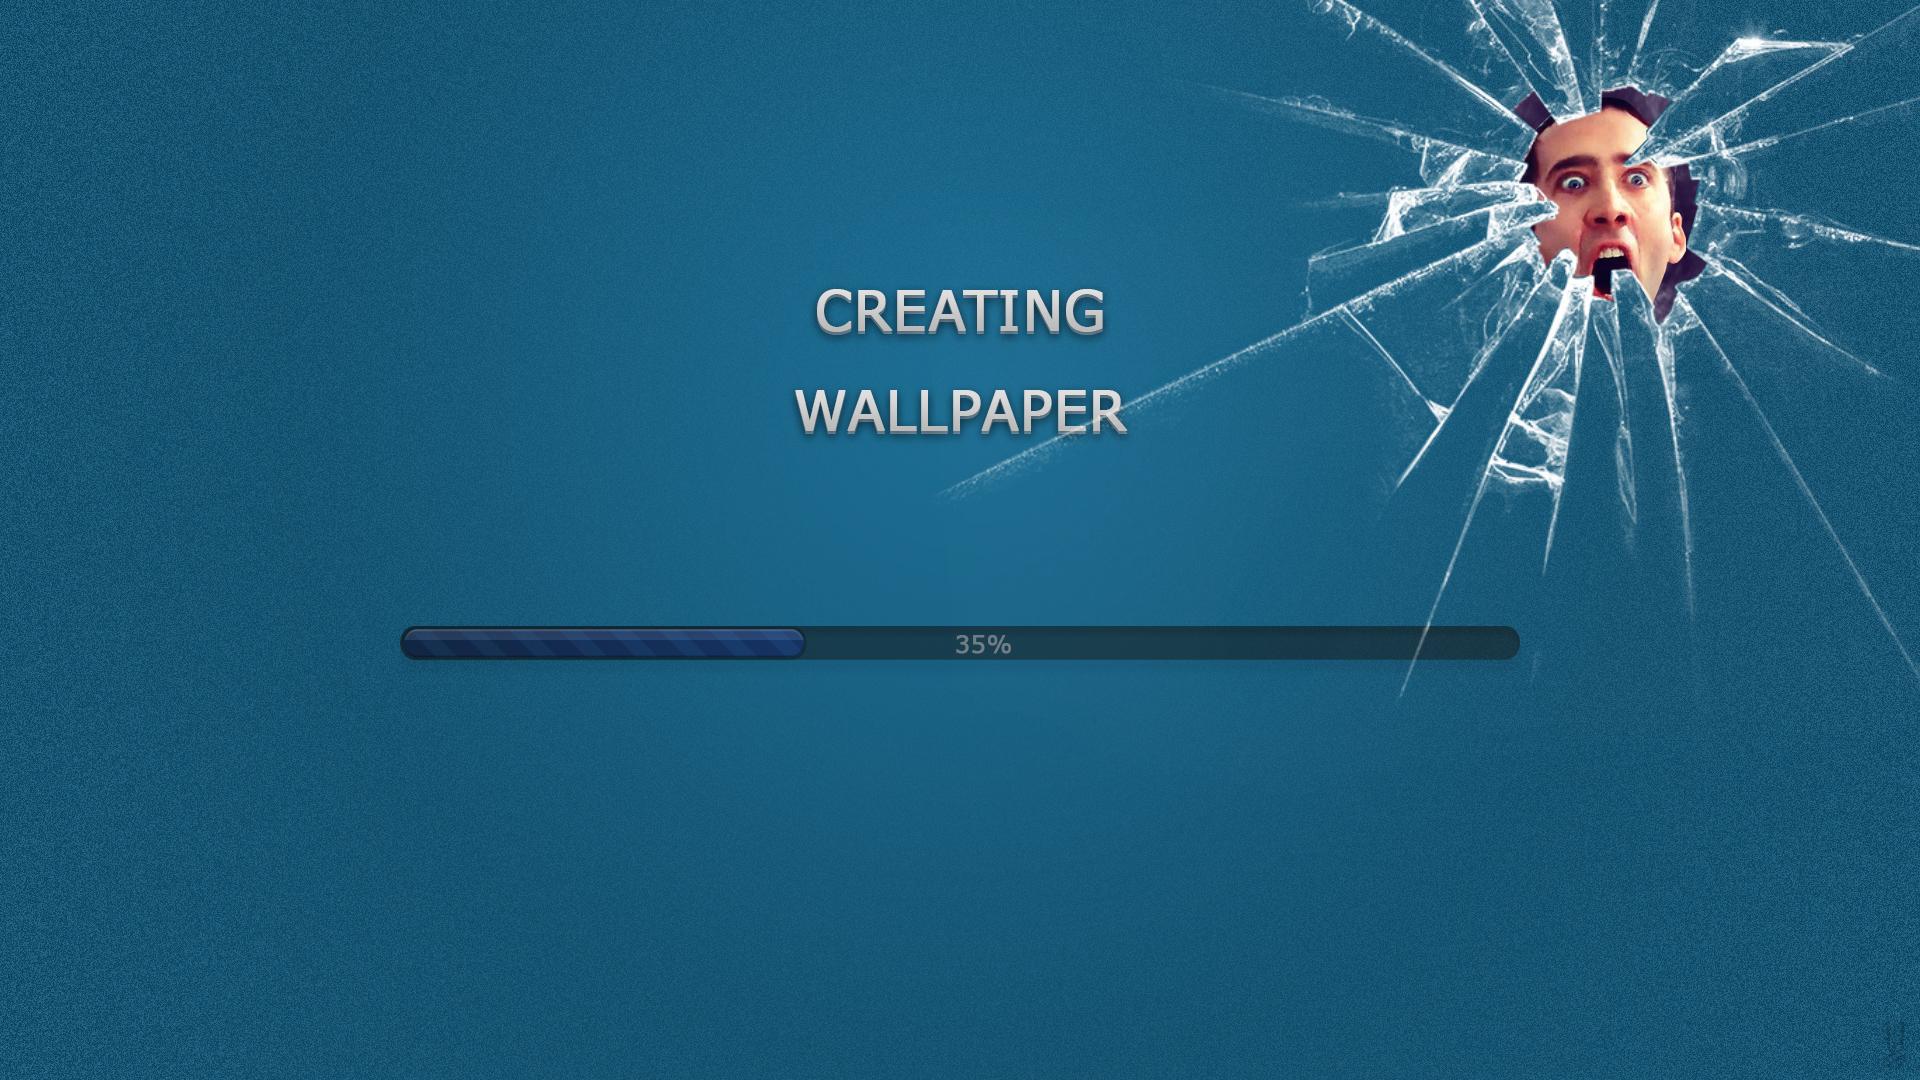 Creepy Cage Computer Wallpapers Desktop Backgrounds 1920x1080 ID 1920x1080